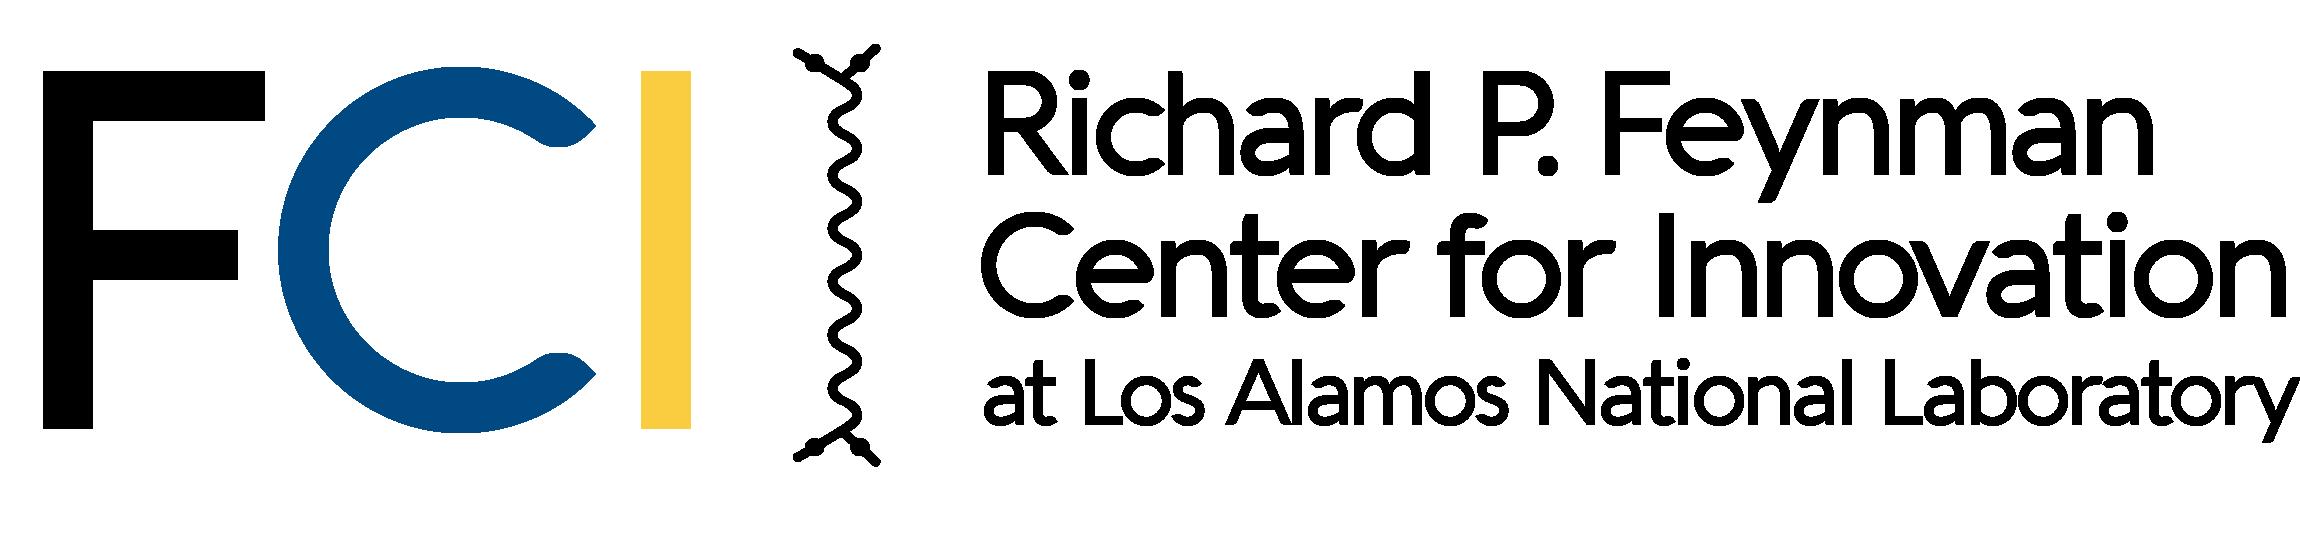 Richard P. Feynman Center for Innovation